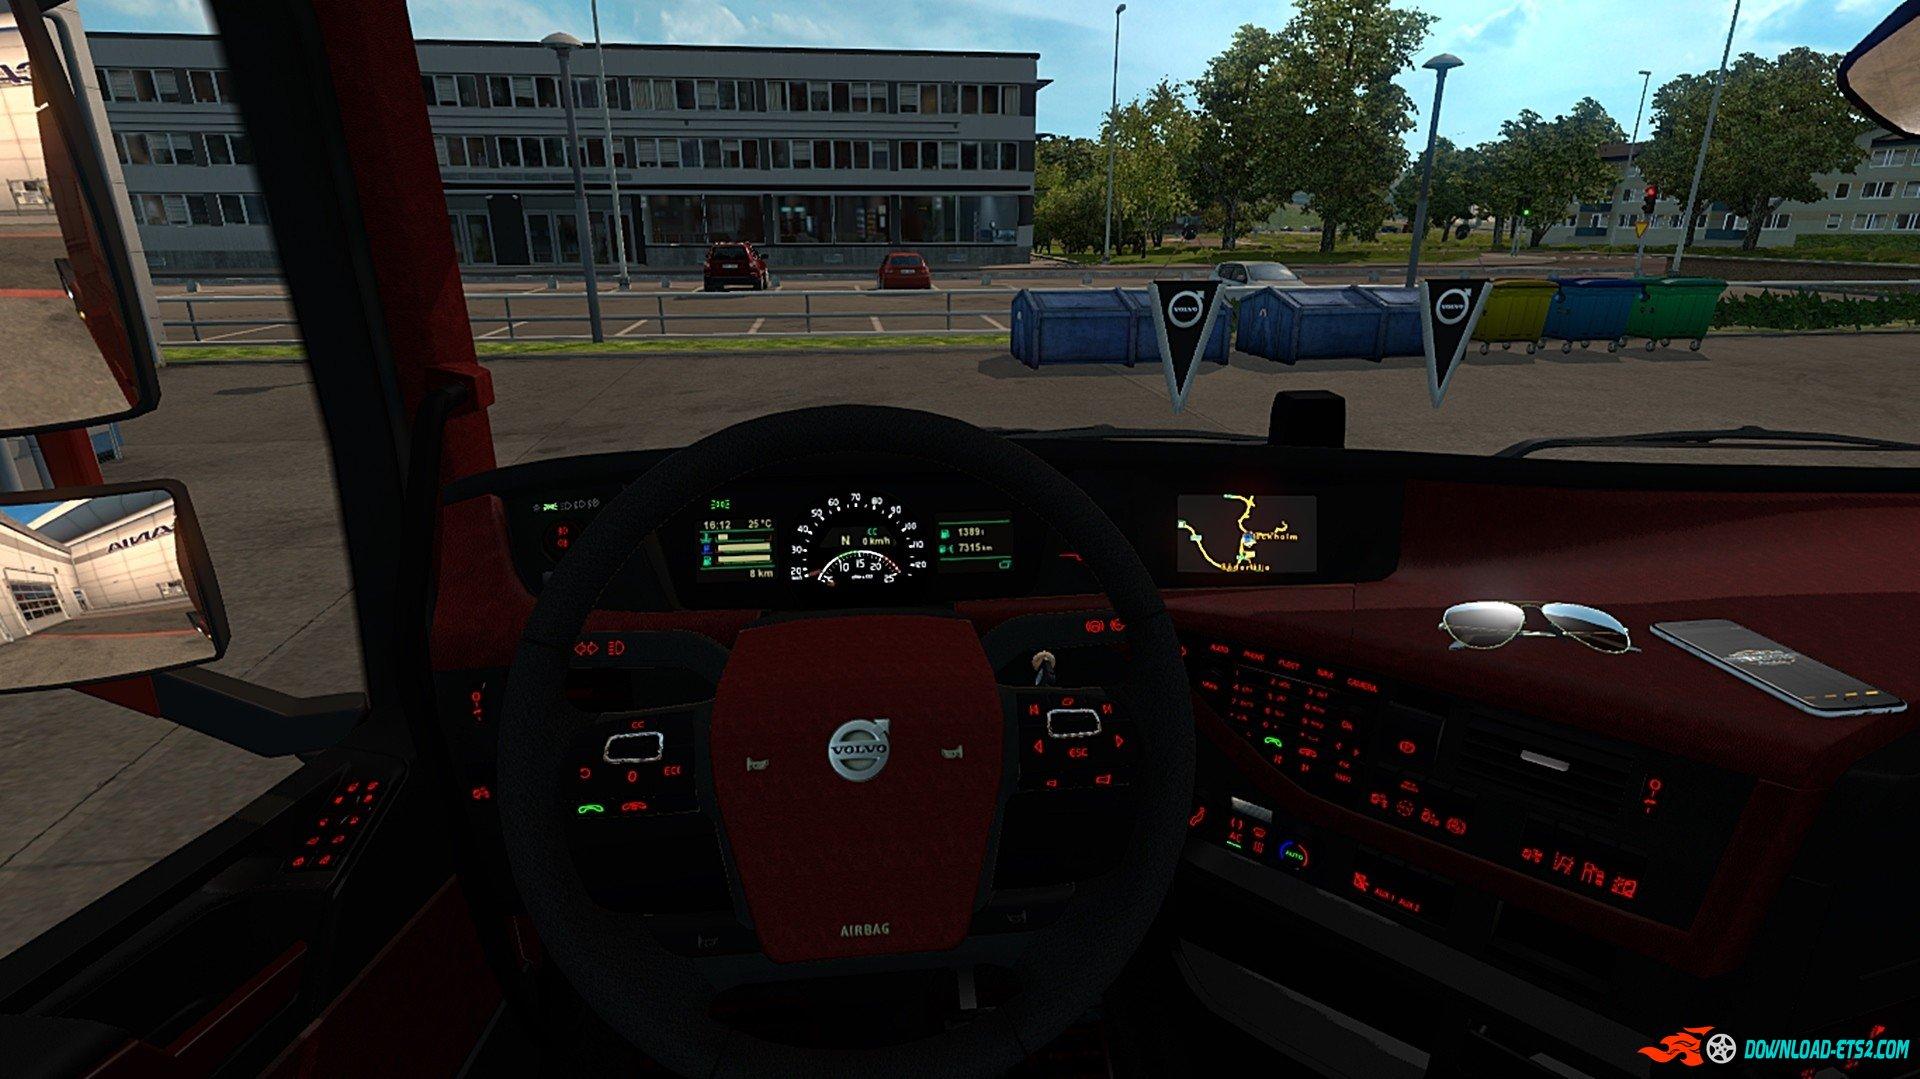 Volvo FH 16 2012 Black&Red Interior